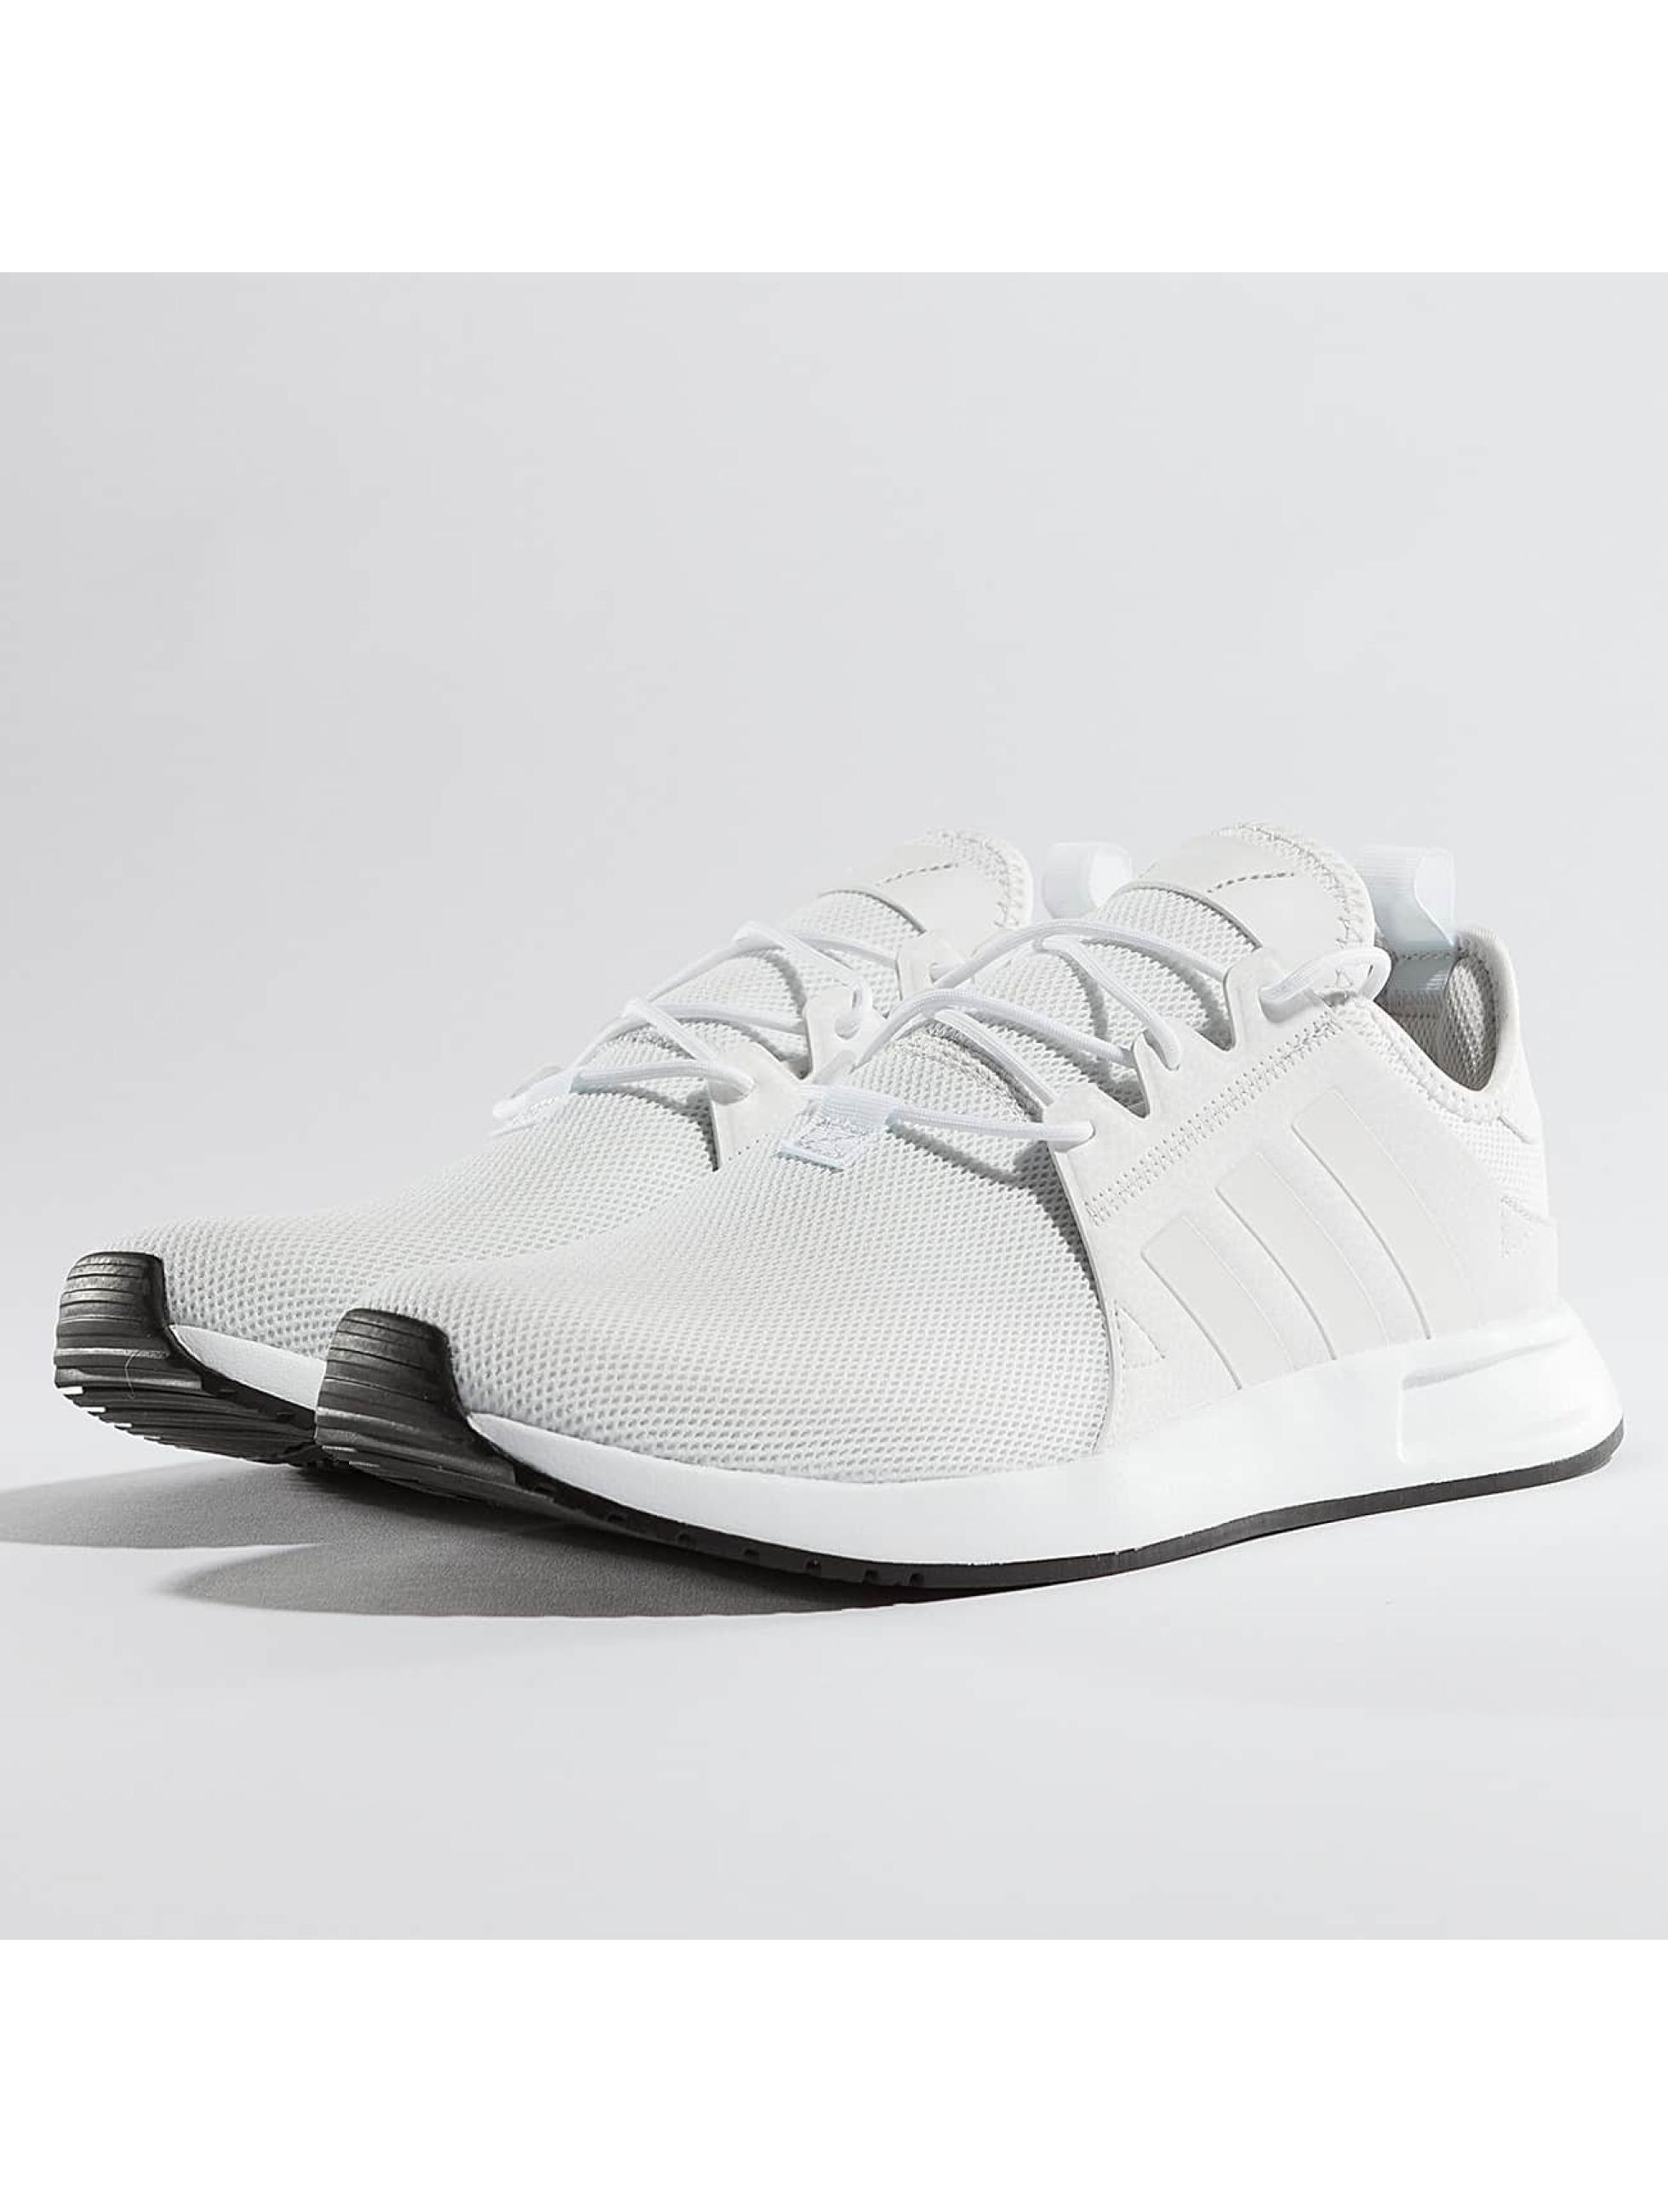 adidas Männer Sneaker X_PLR in weiß